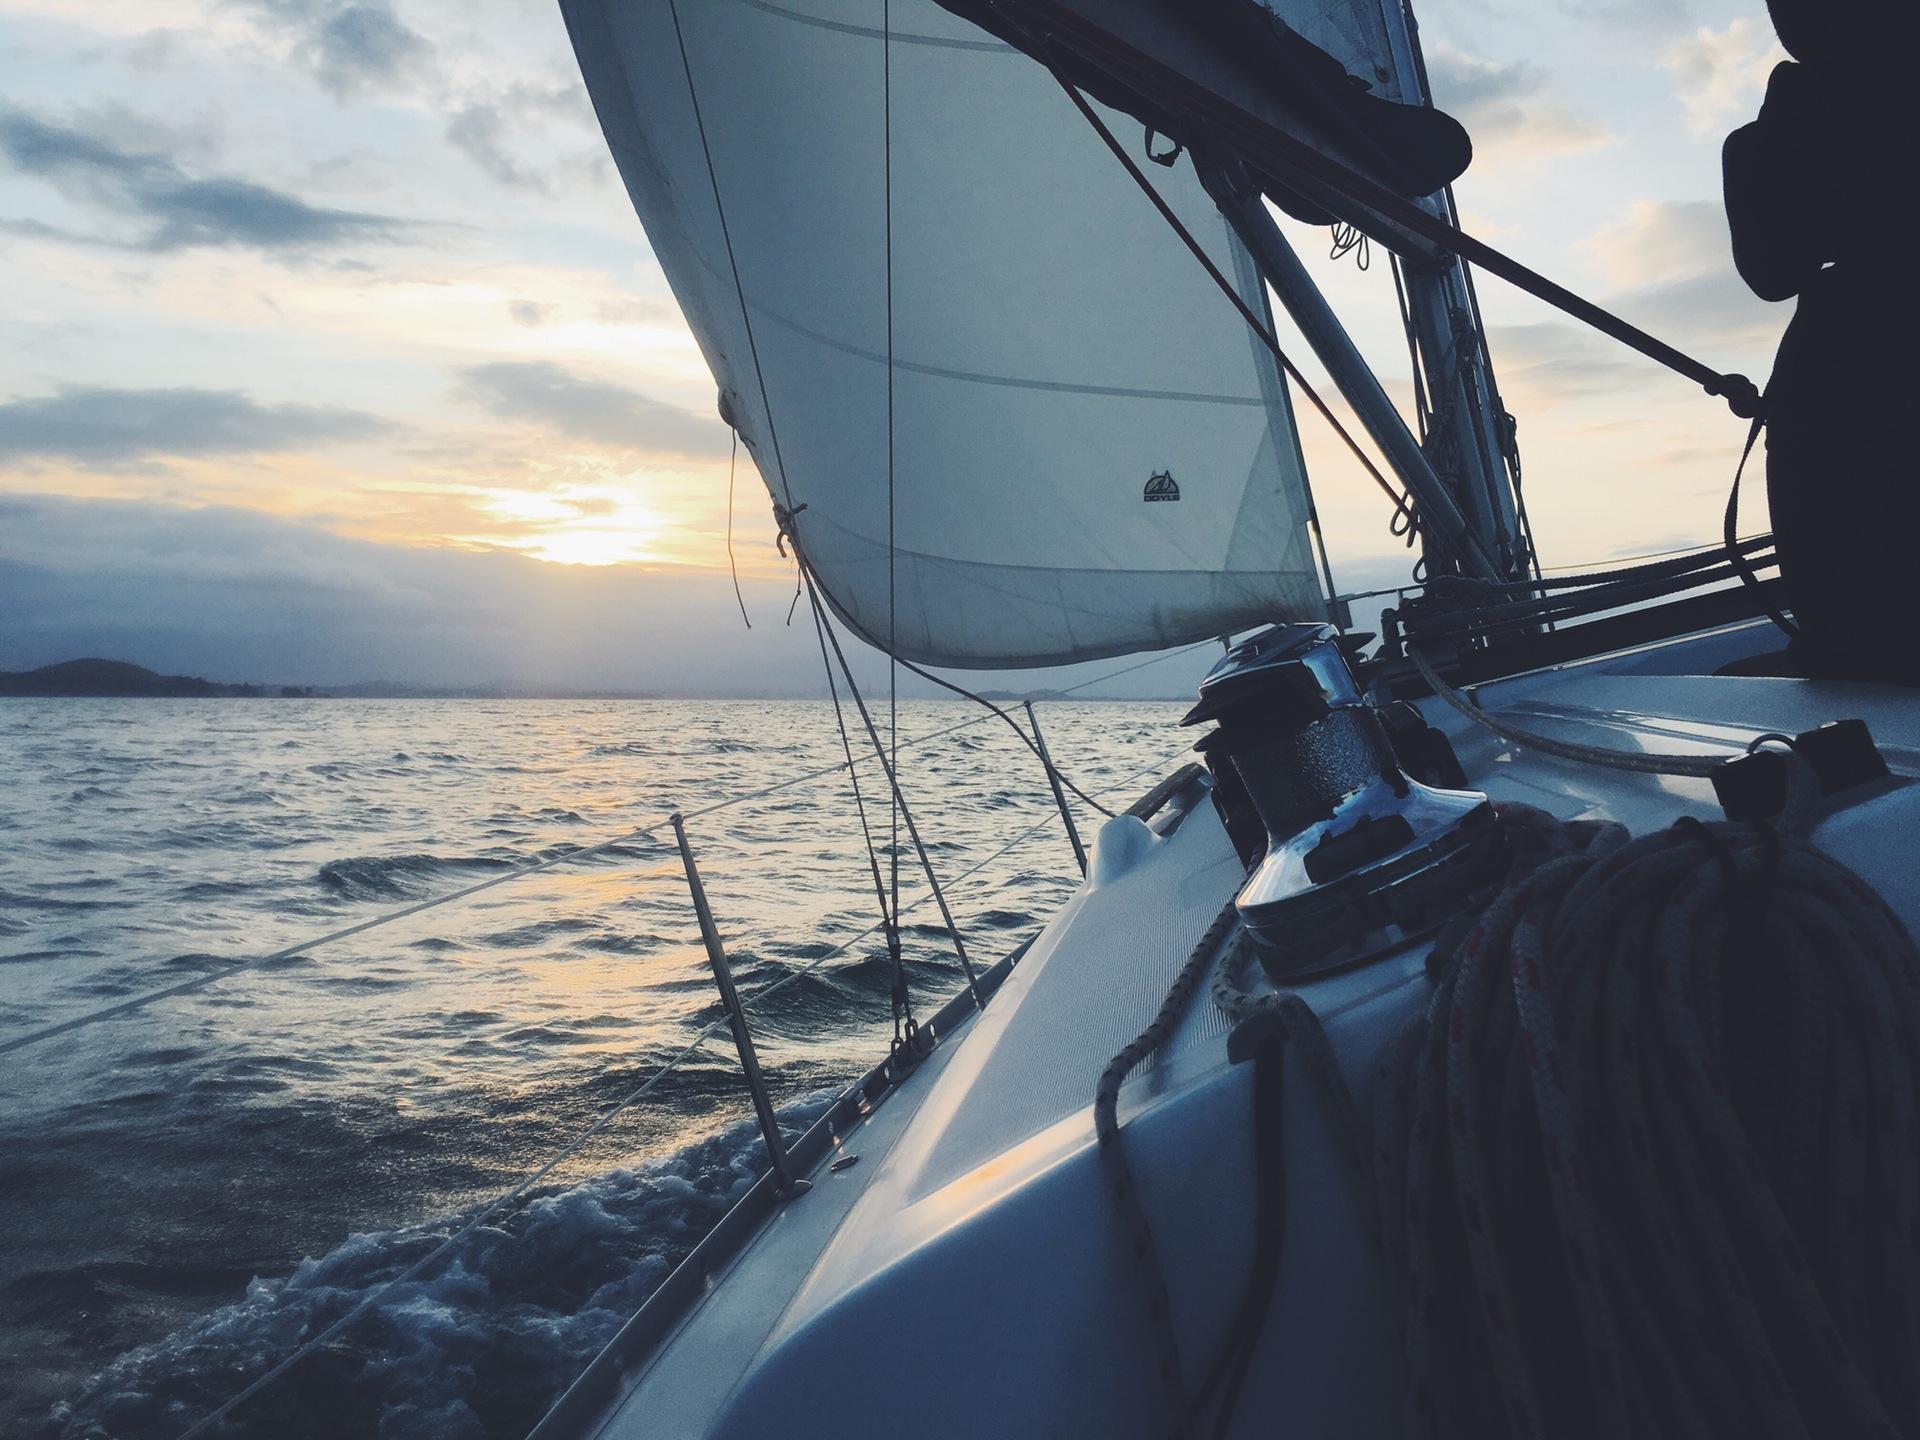 Yacht, Mer, Parcourir, Océan, Croisière - Fonds d'écran HD - Professor-falken.com